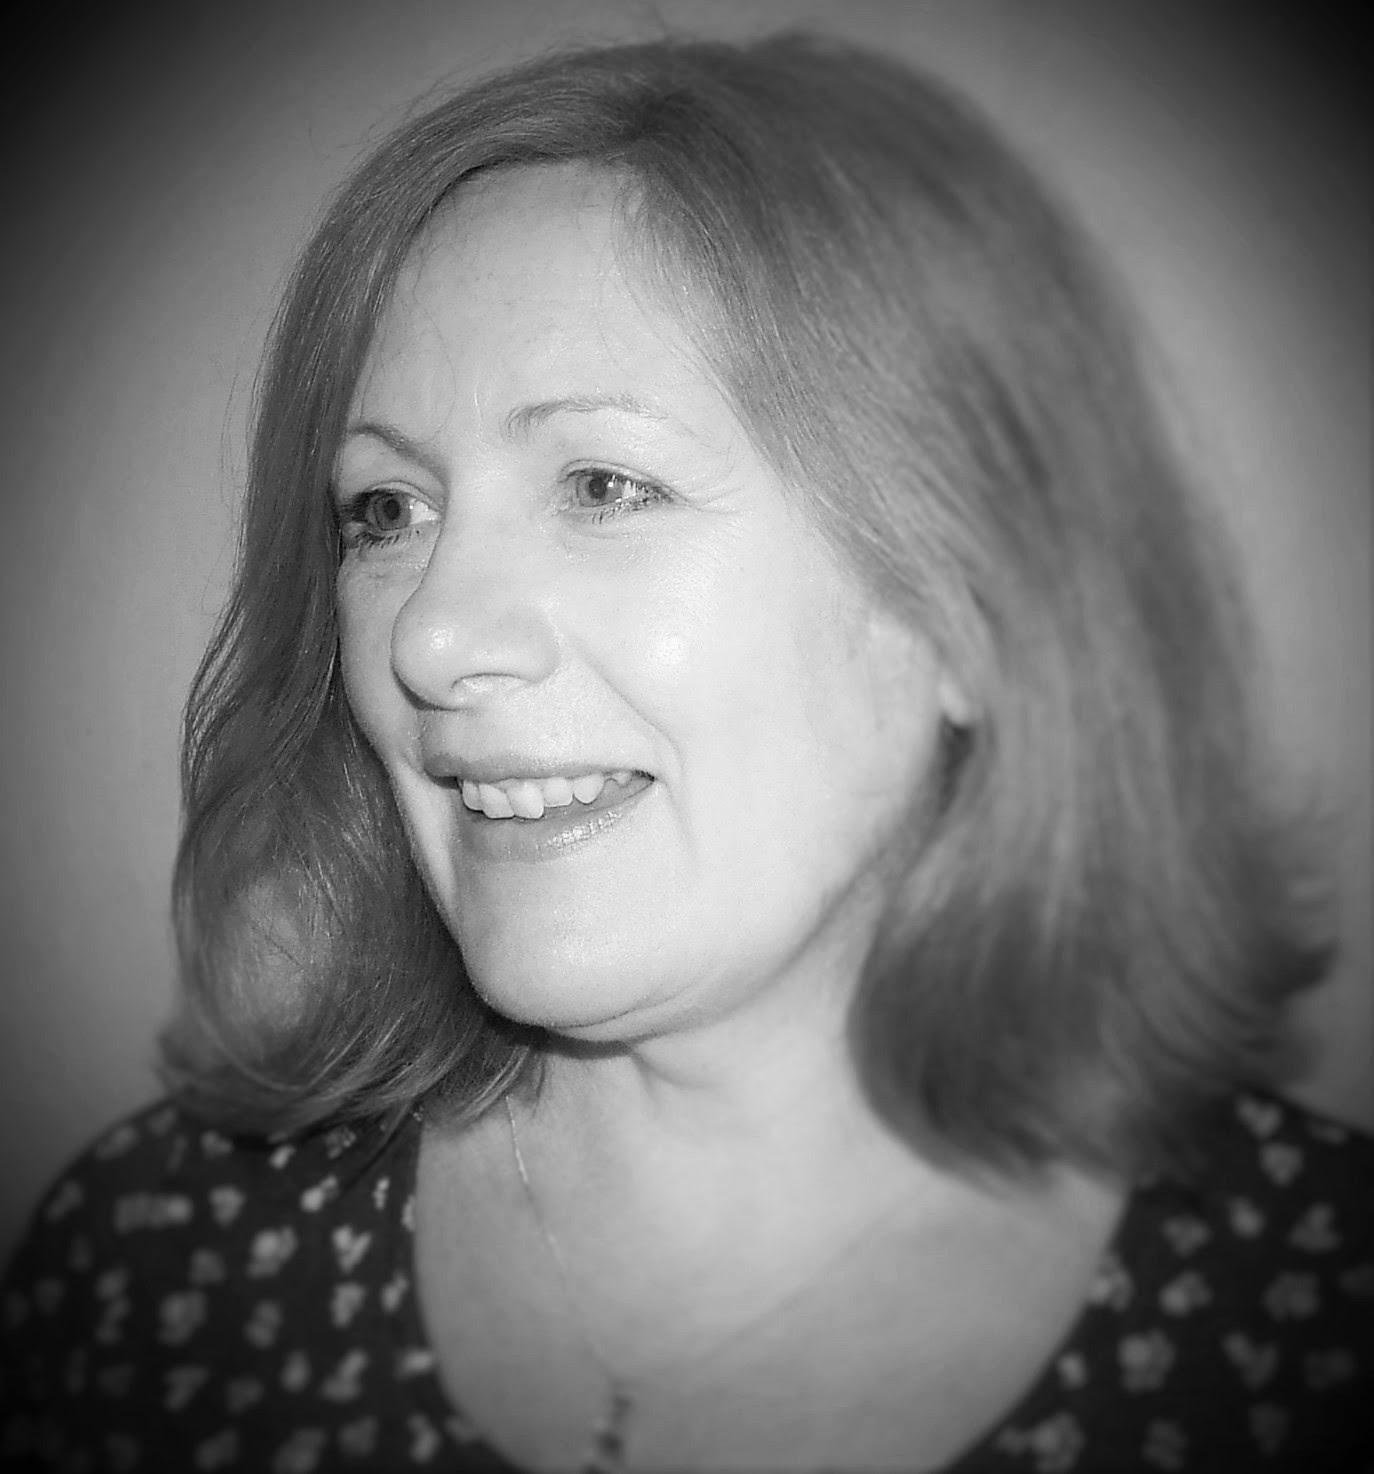 Photograph of author, Jaqueline Ward